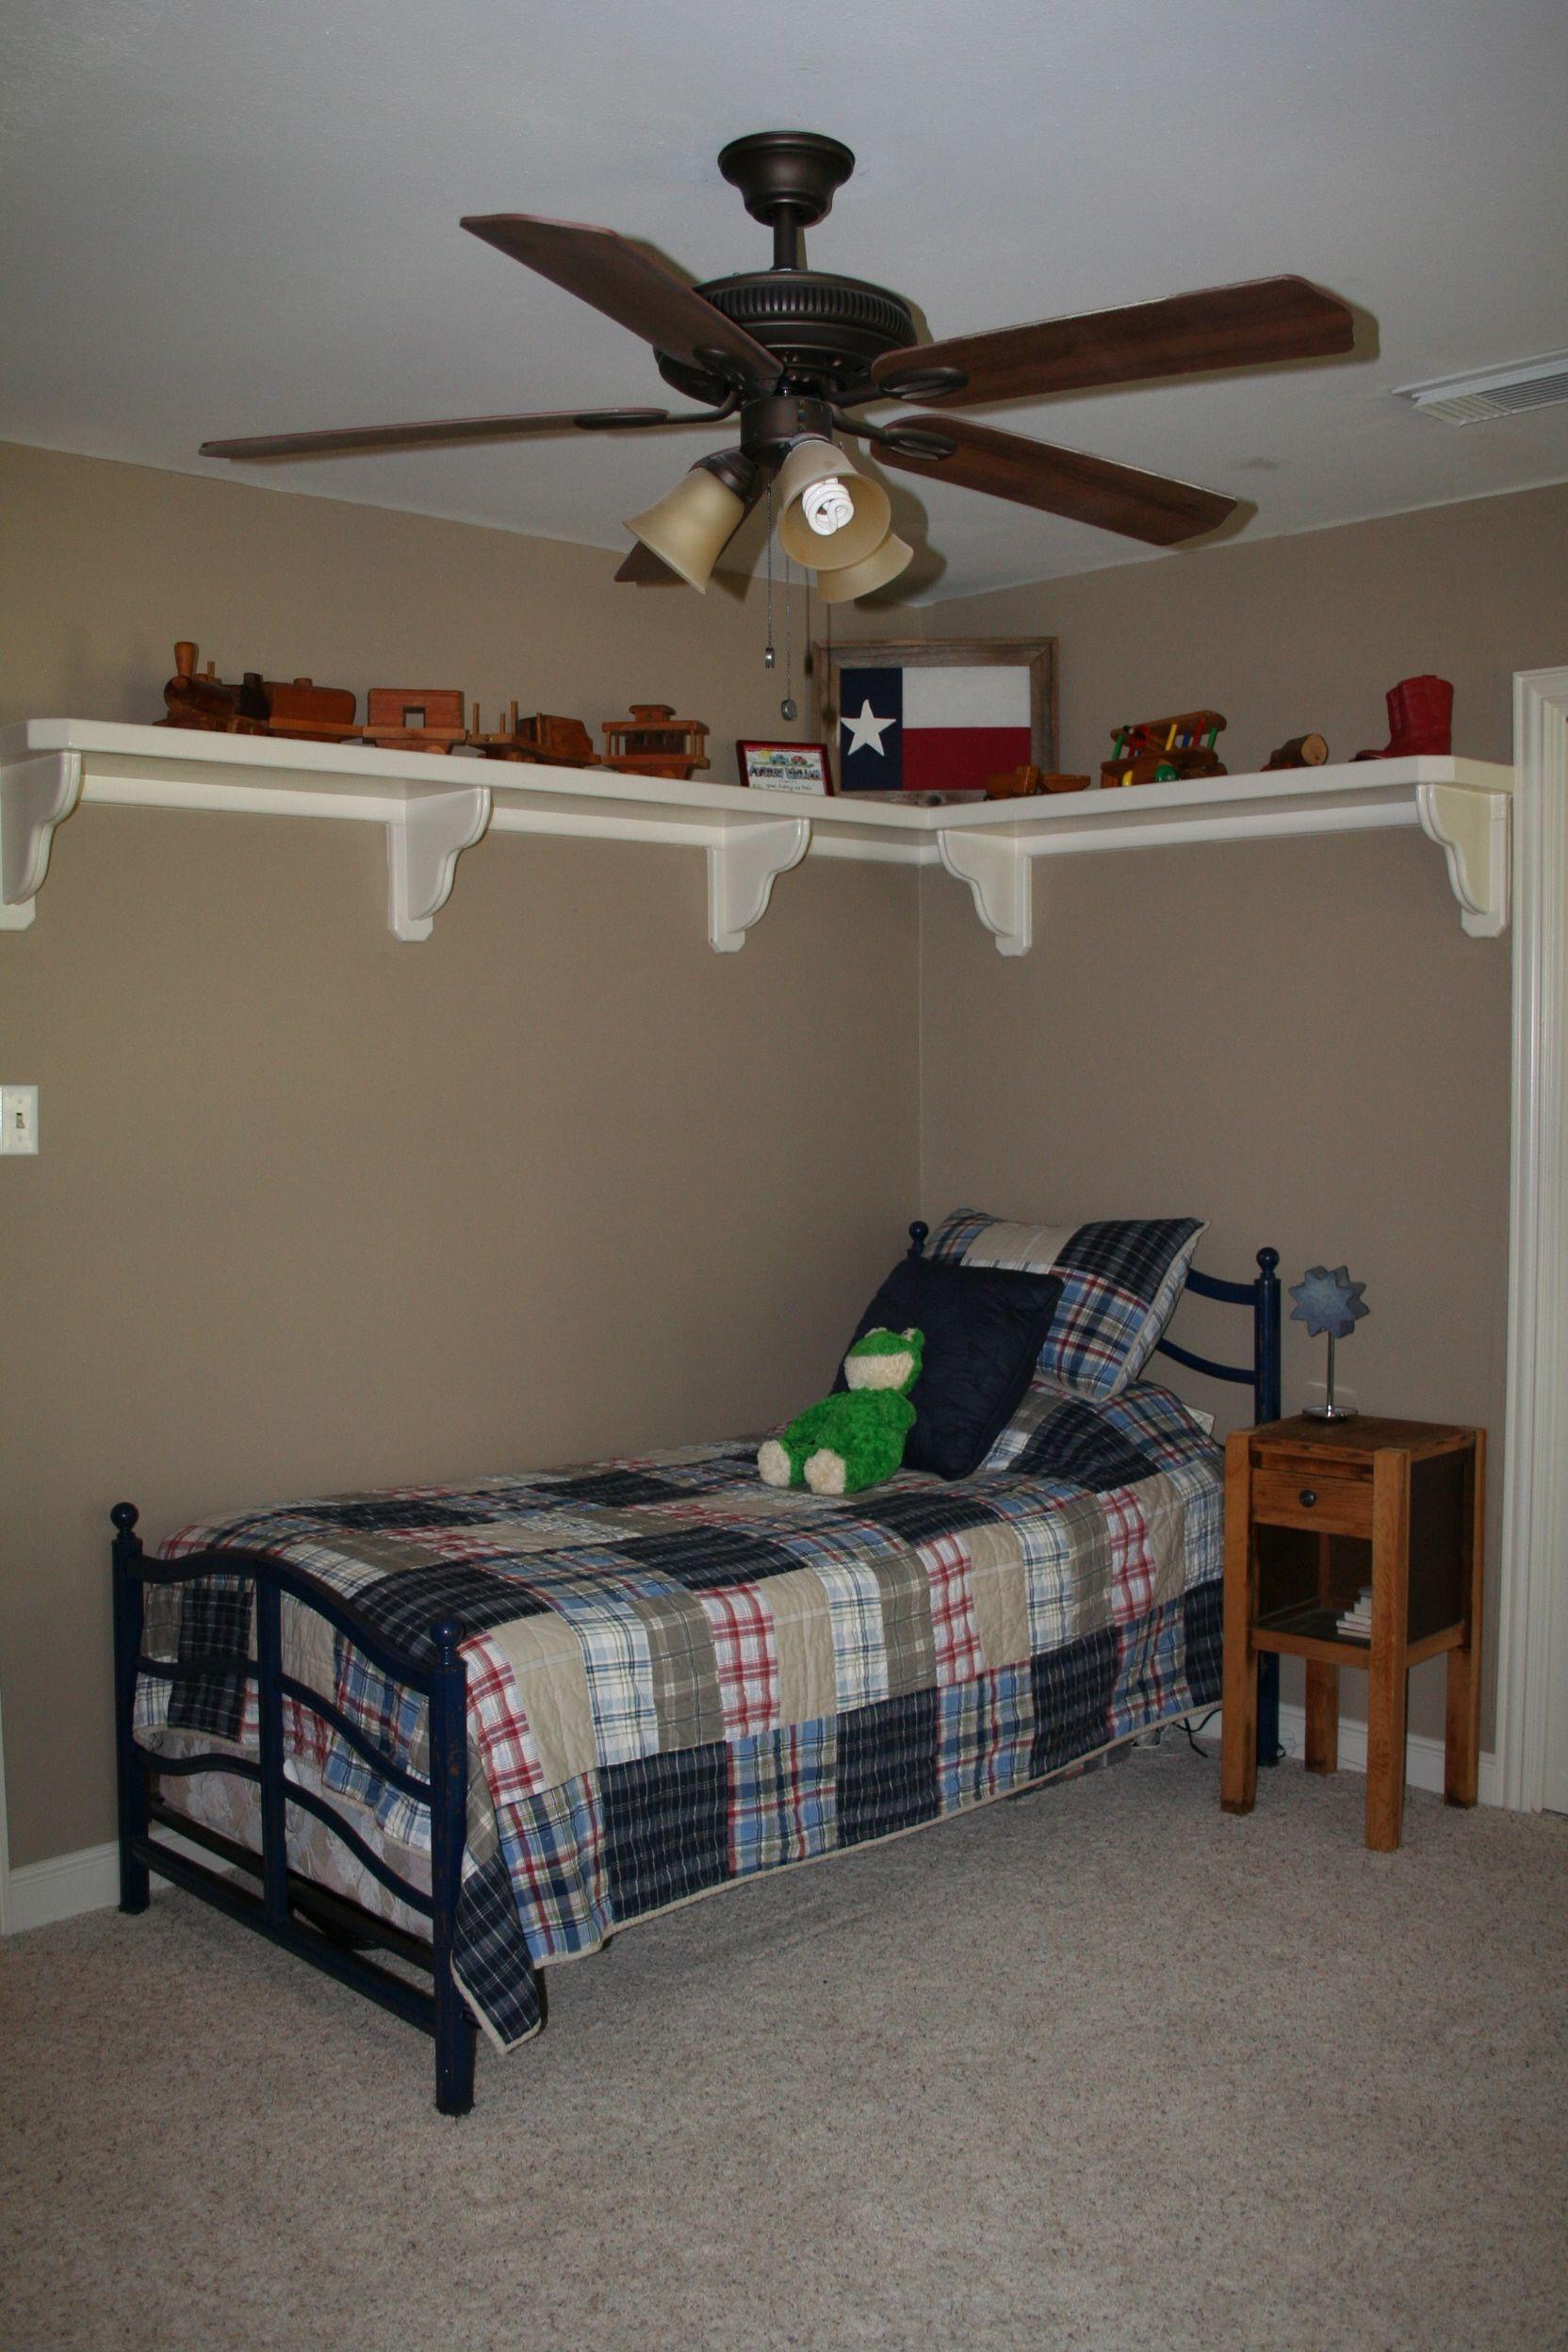 Trophy Room Design Ideas: I Kind Of Like This Shelf. I Want To Do Something Like It